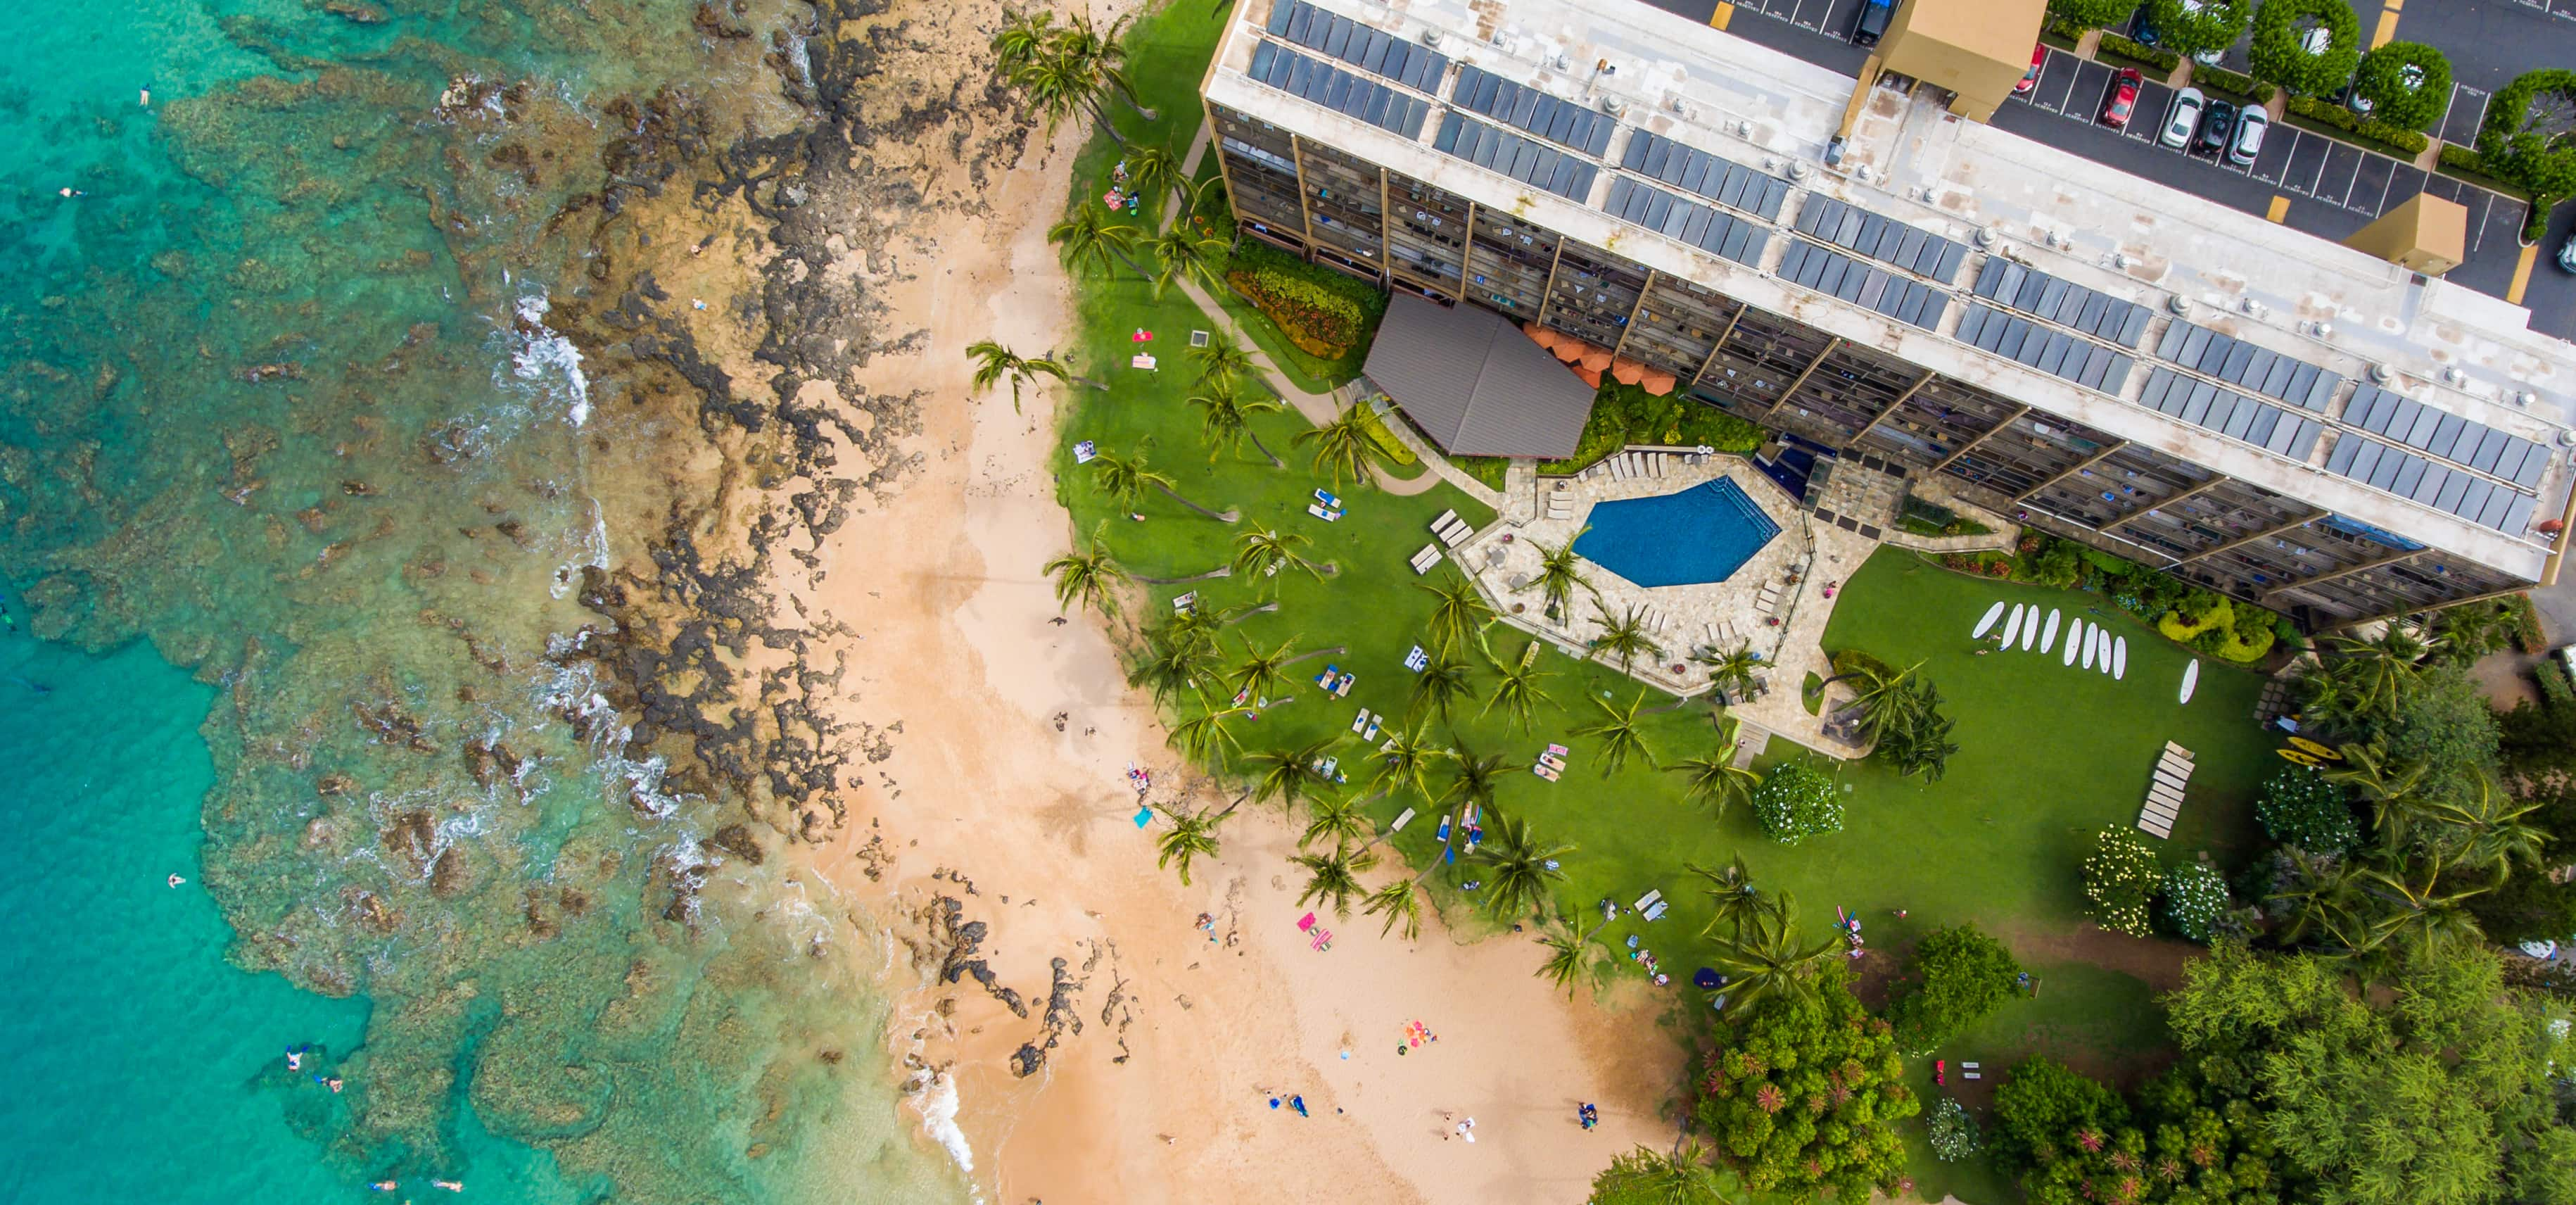 Mana Kai Aerial Top View copy